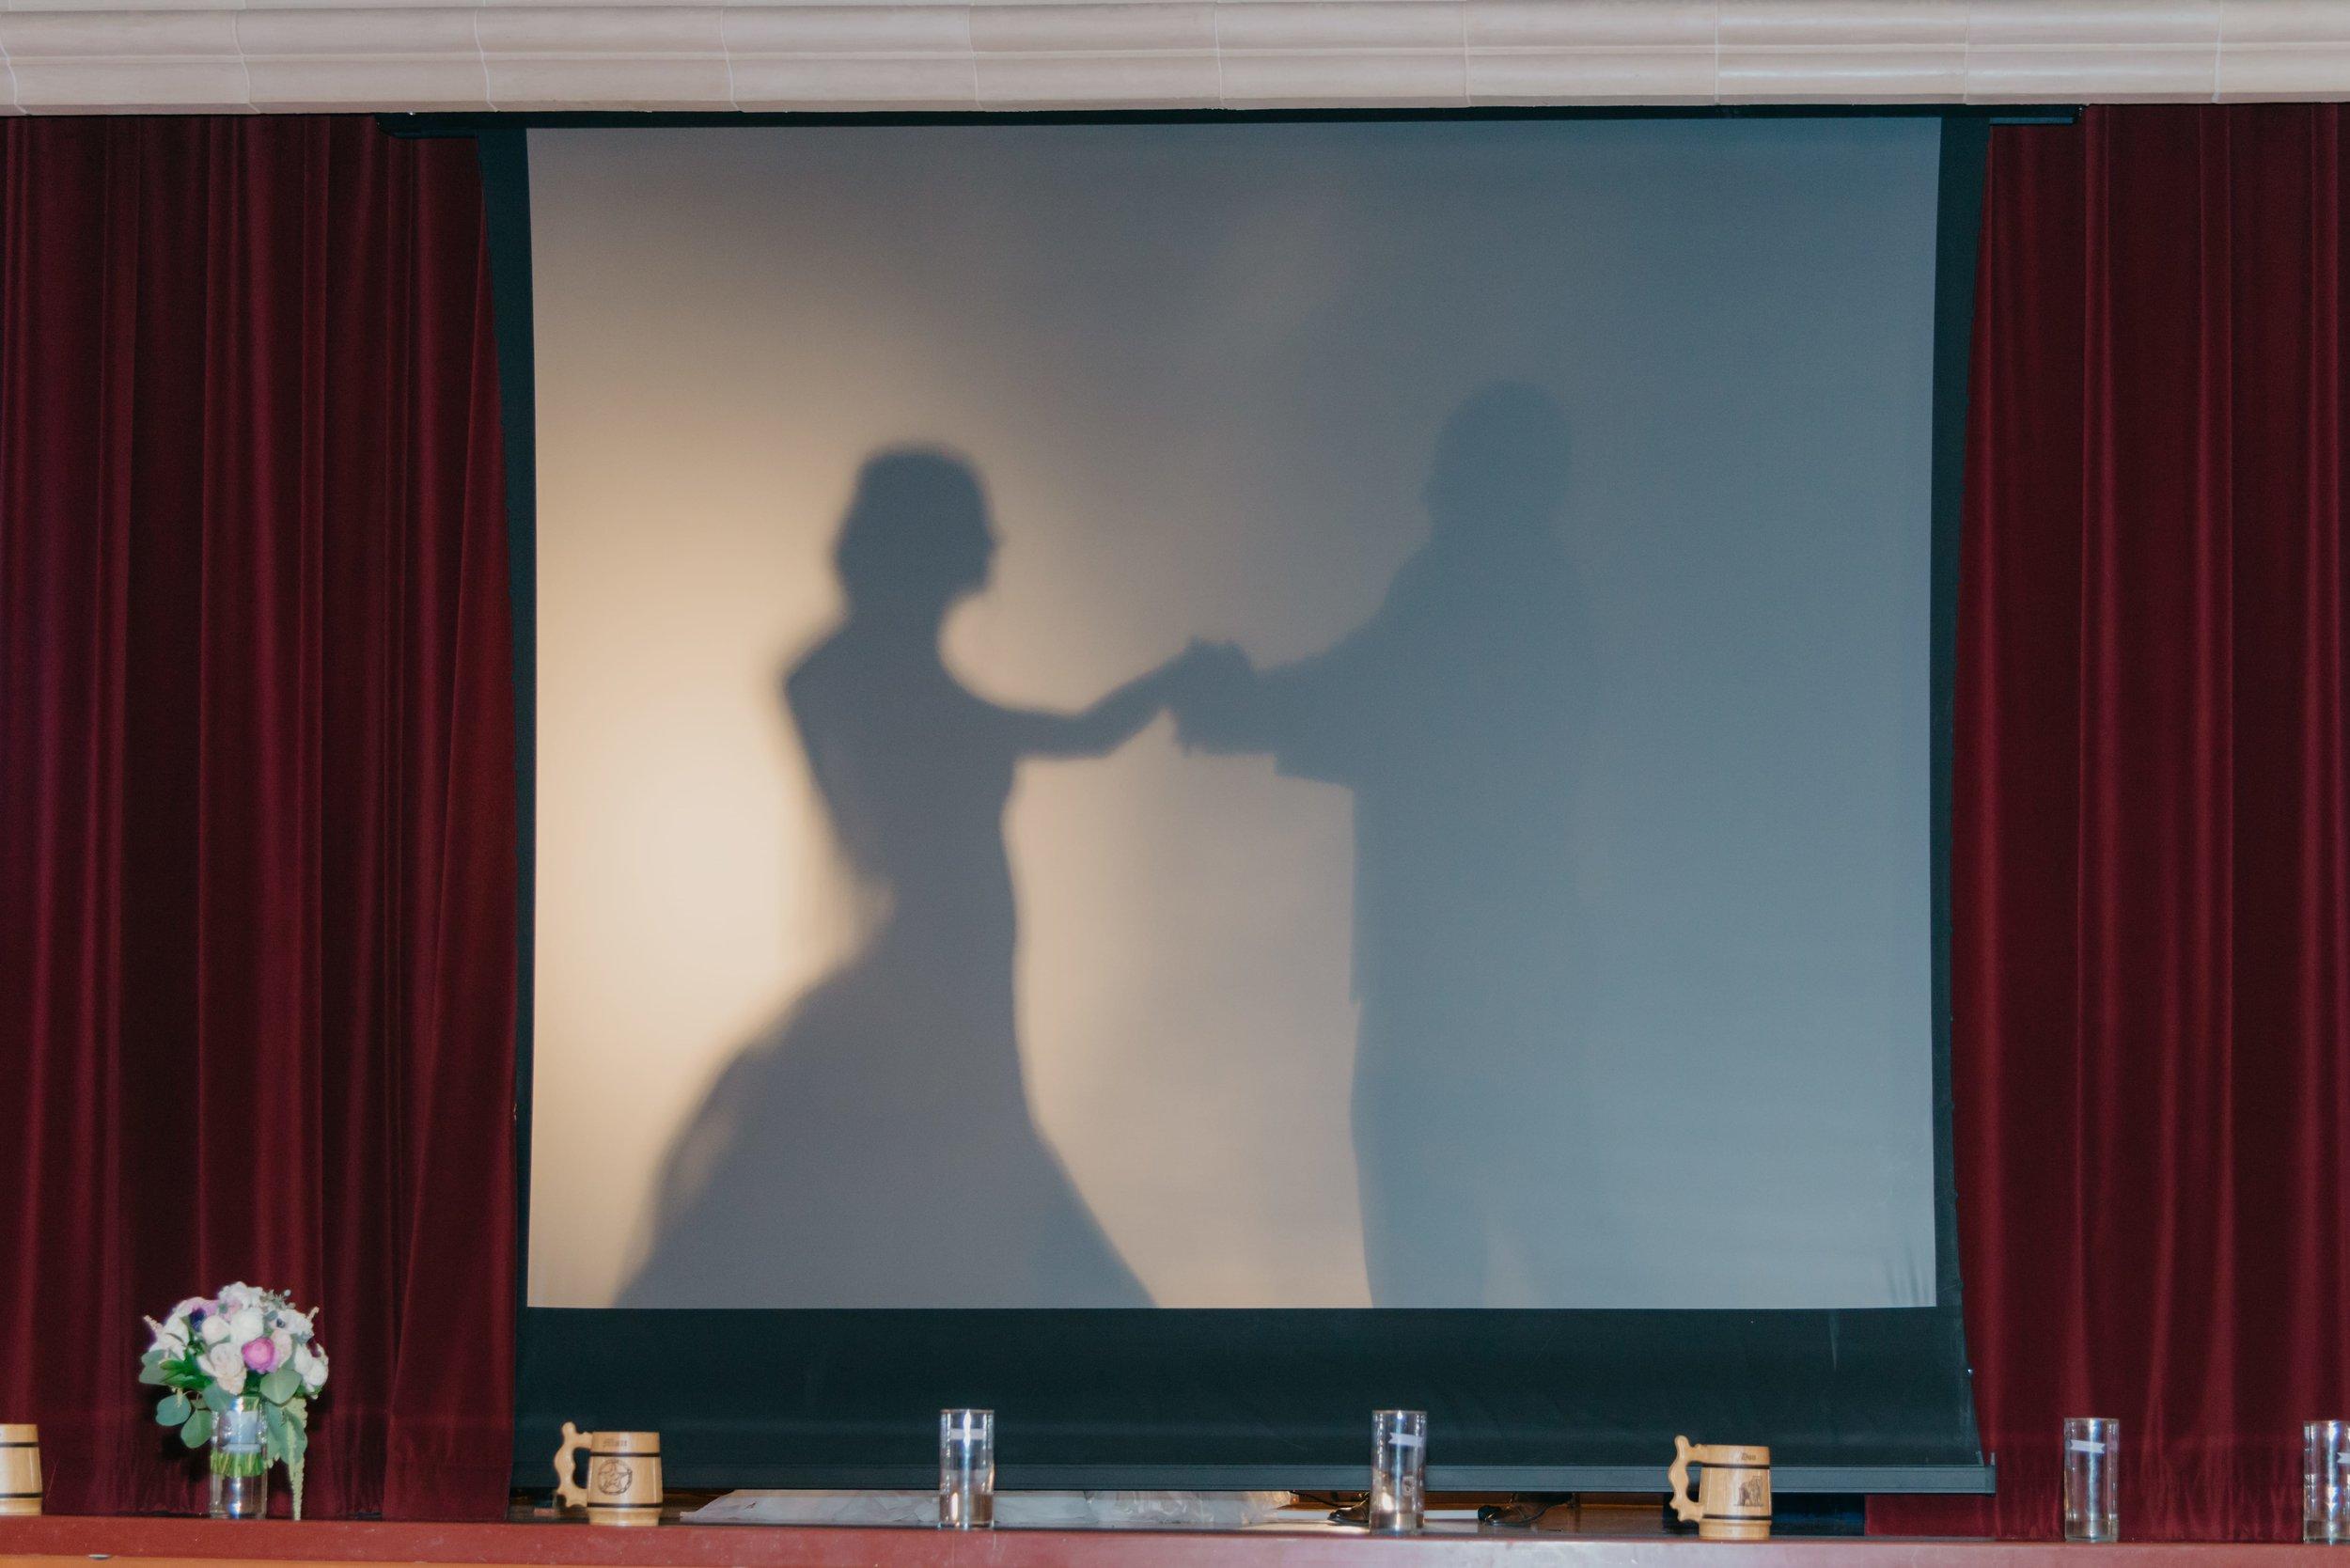 Wedding Cocktail Hour Entertainment - Slideshow of the Couple - Wedding Video